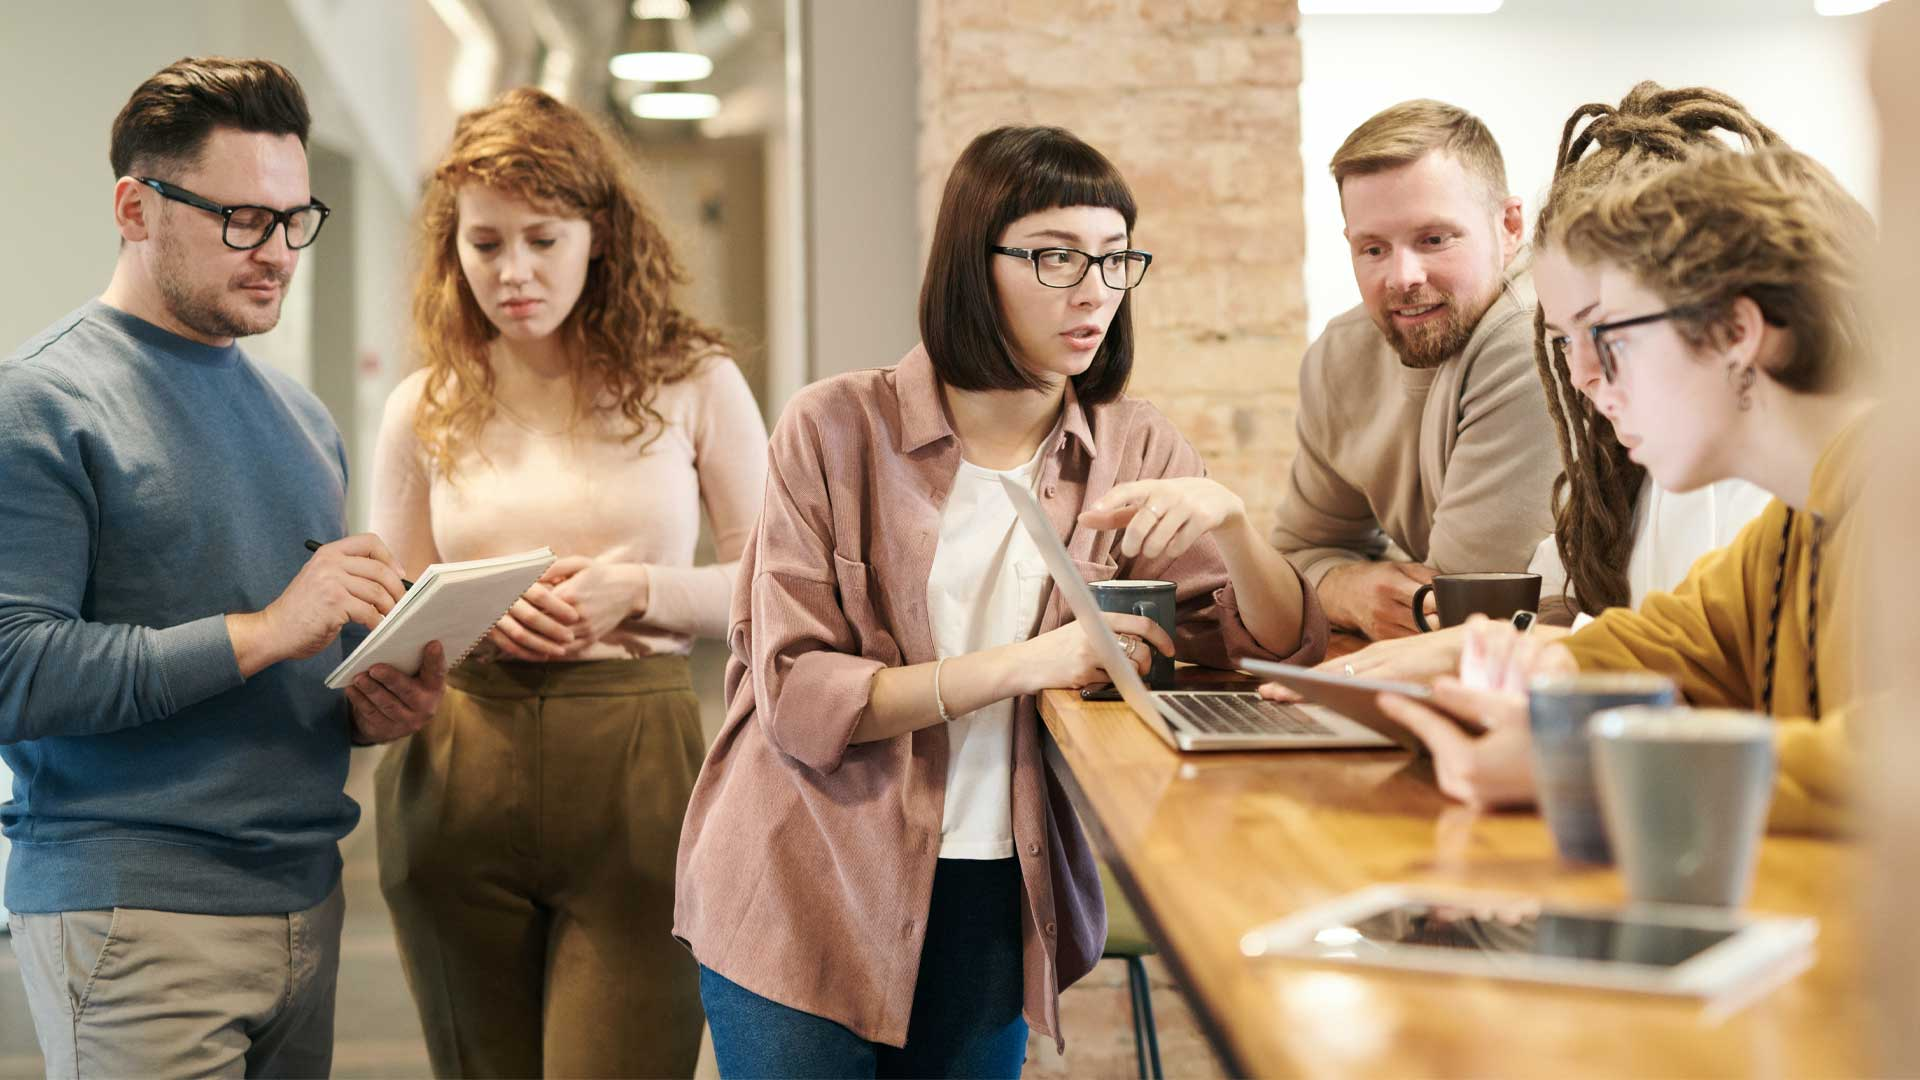 Gestion des ressources humaines le leadership collectif